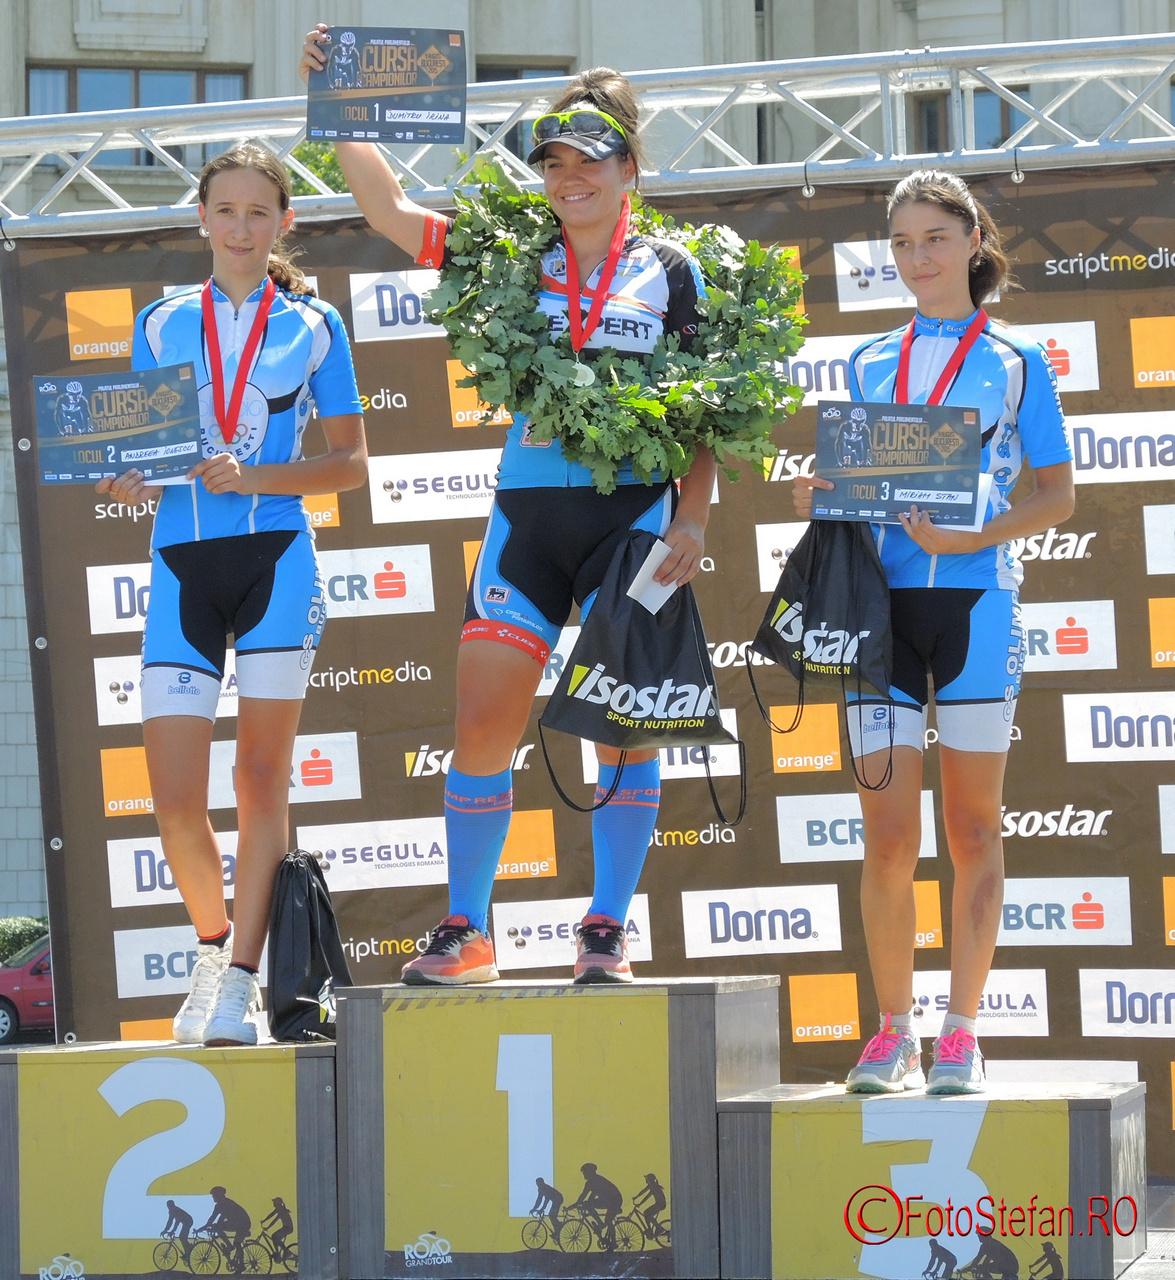 Andreea Ionescu, Dumitru Irina, Miriam Stan ciclism poze